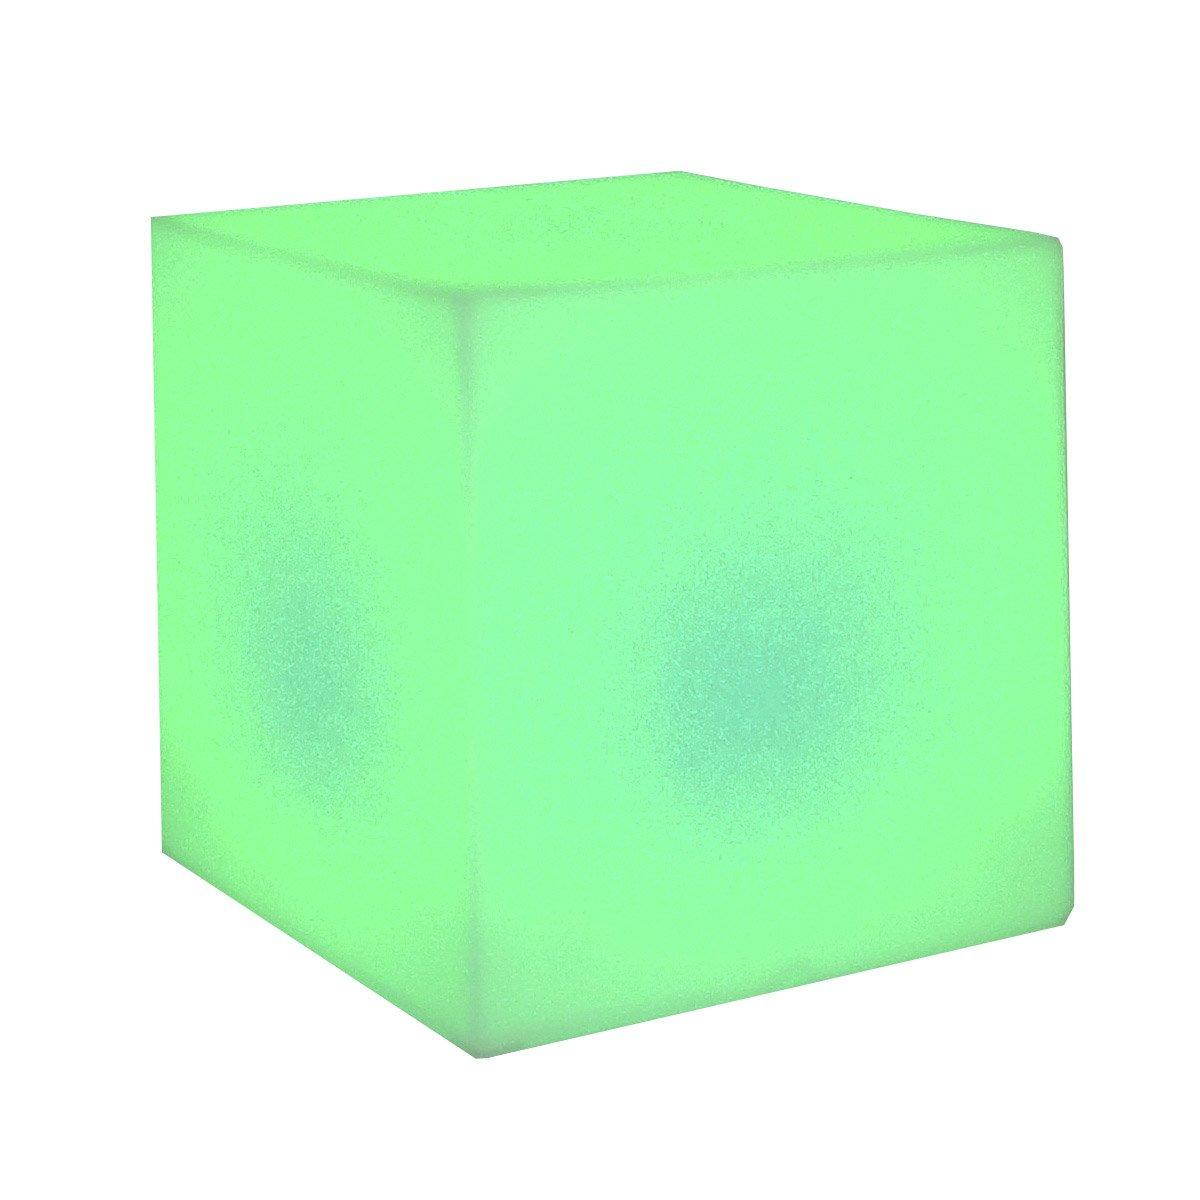 Cuby 32 cube iluminado Outdoor batería recargable LED RGB 32x32x32cm